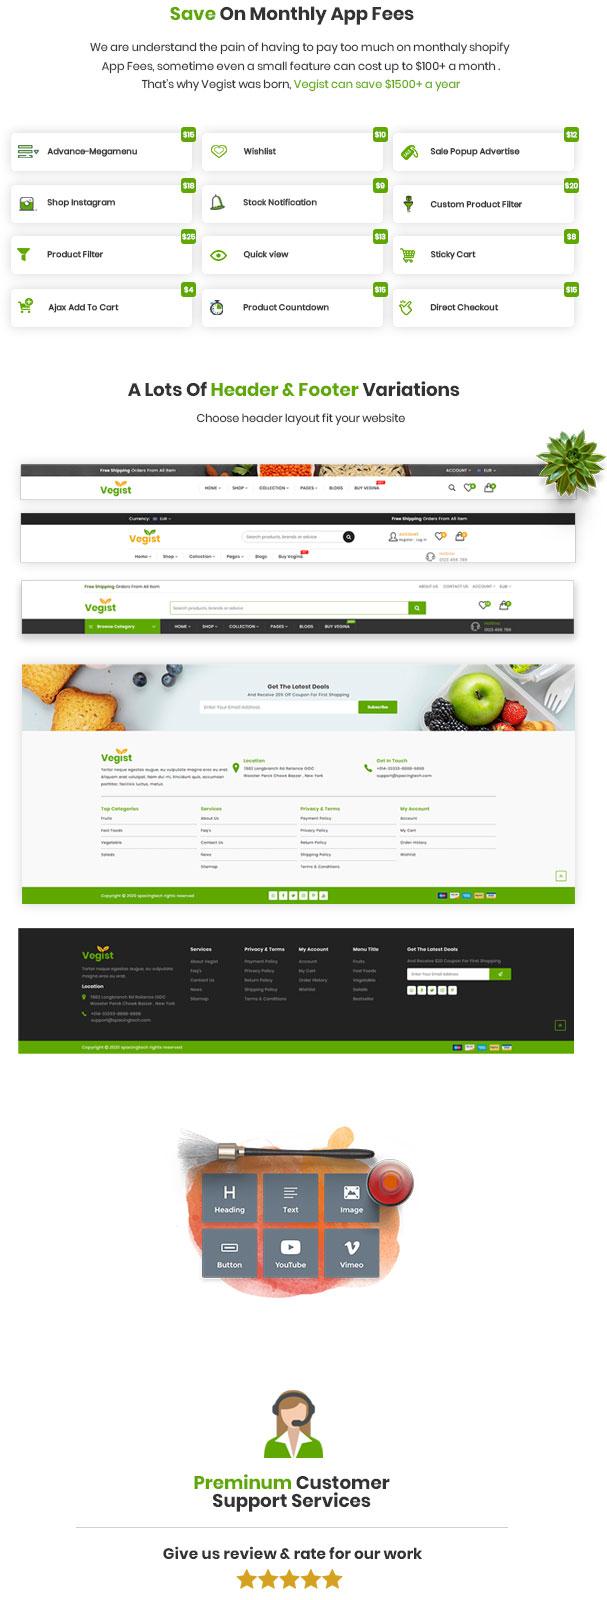 Vegist - The  Vegetables, Supermarket & Organic Food eCommerce Shopify Theme - 9